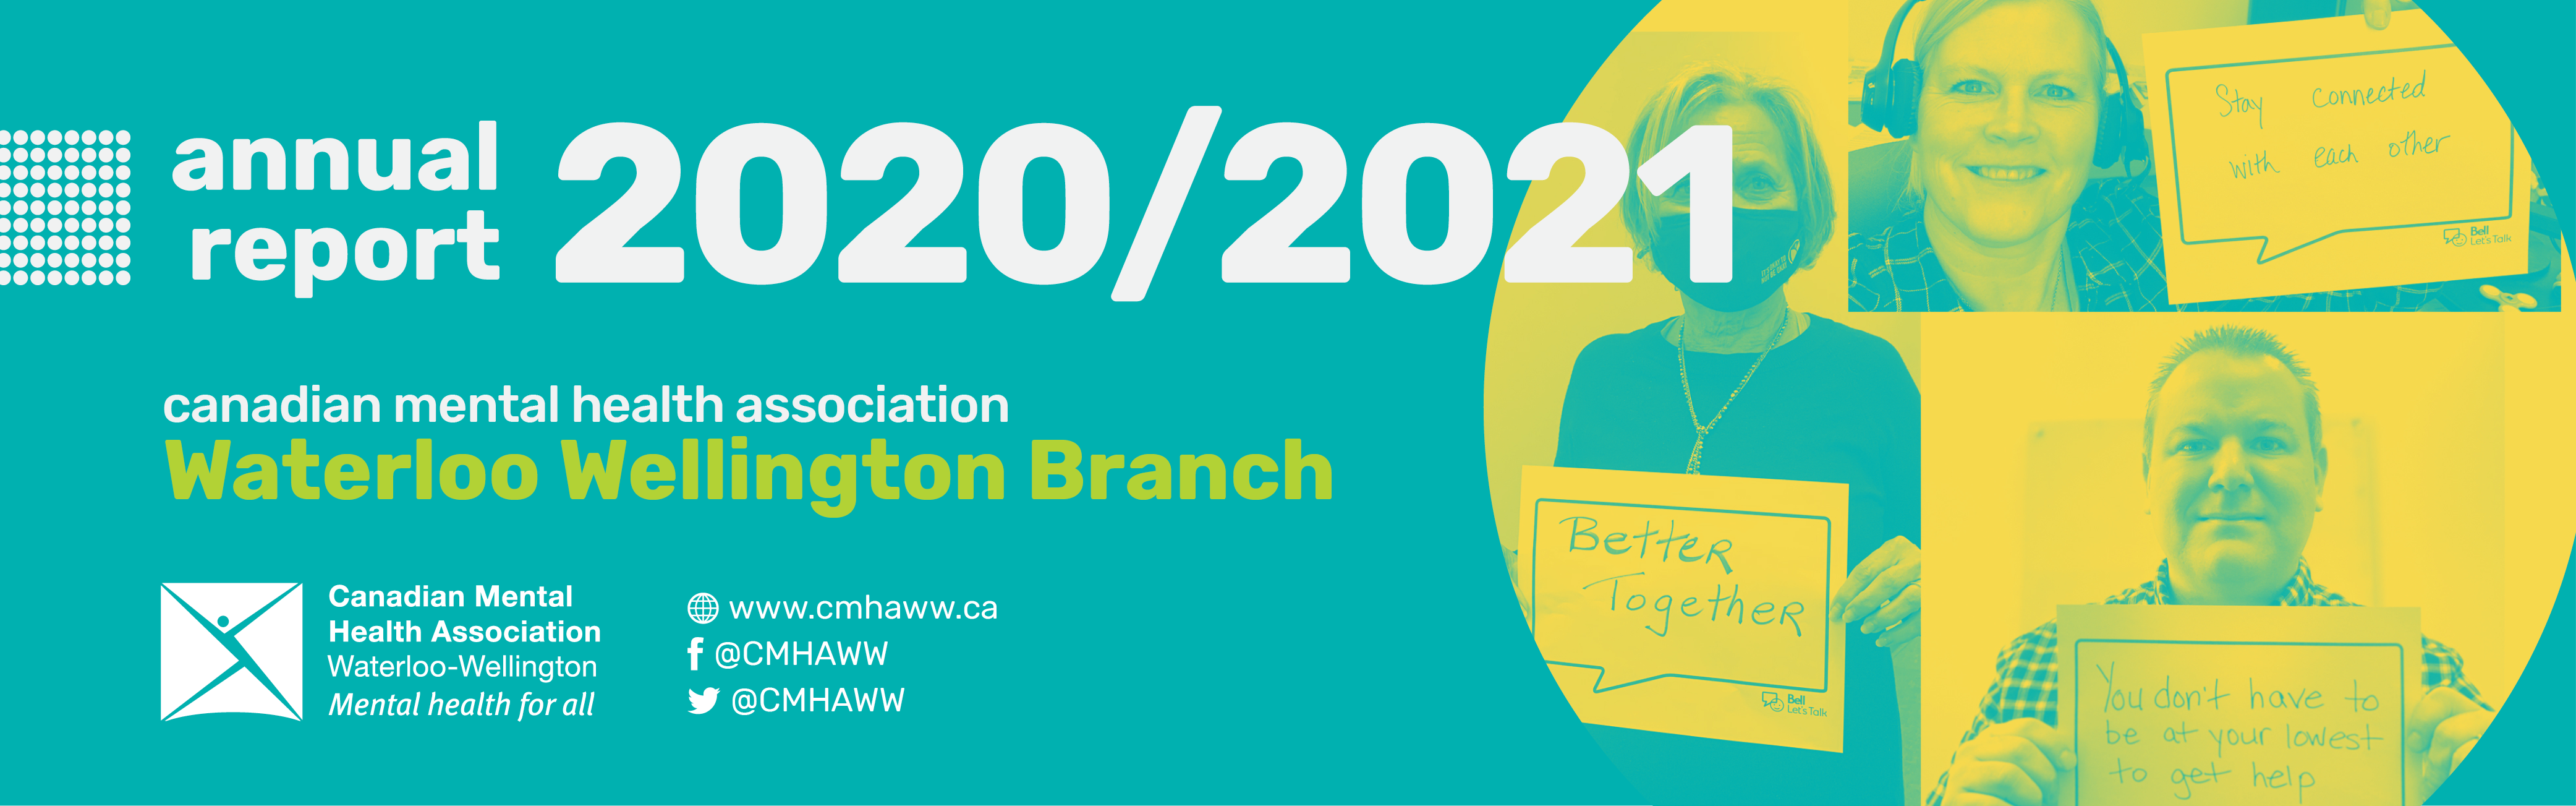 CMHA WW 2020-21 Annual Report